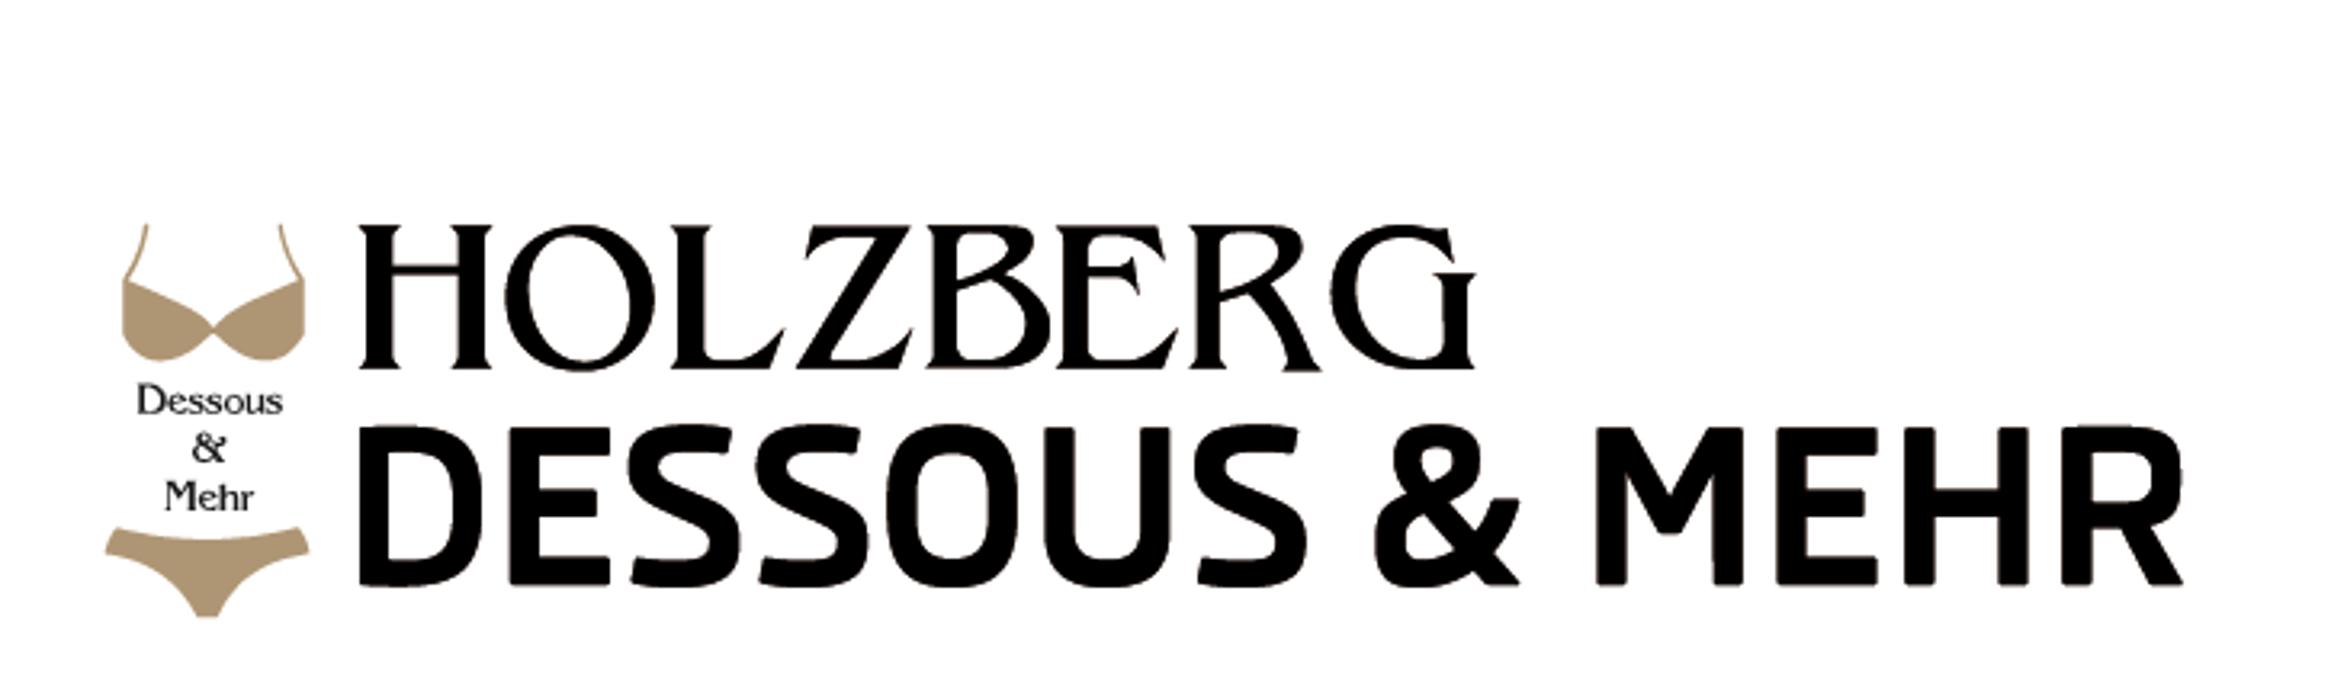 5fa83b32bdab01 Holzberg Dessous & Mehr • Goslar, Hokenstraße 13 - Öffnungszeiten ...